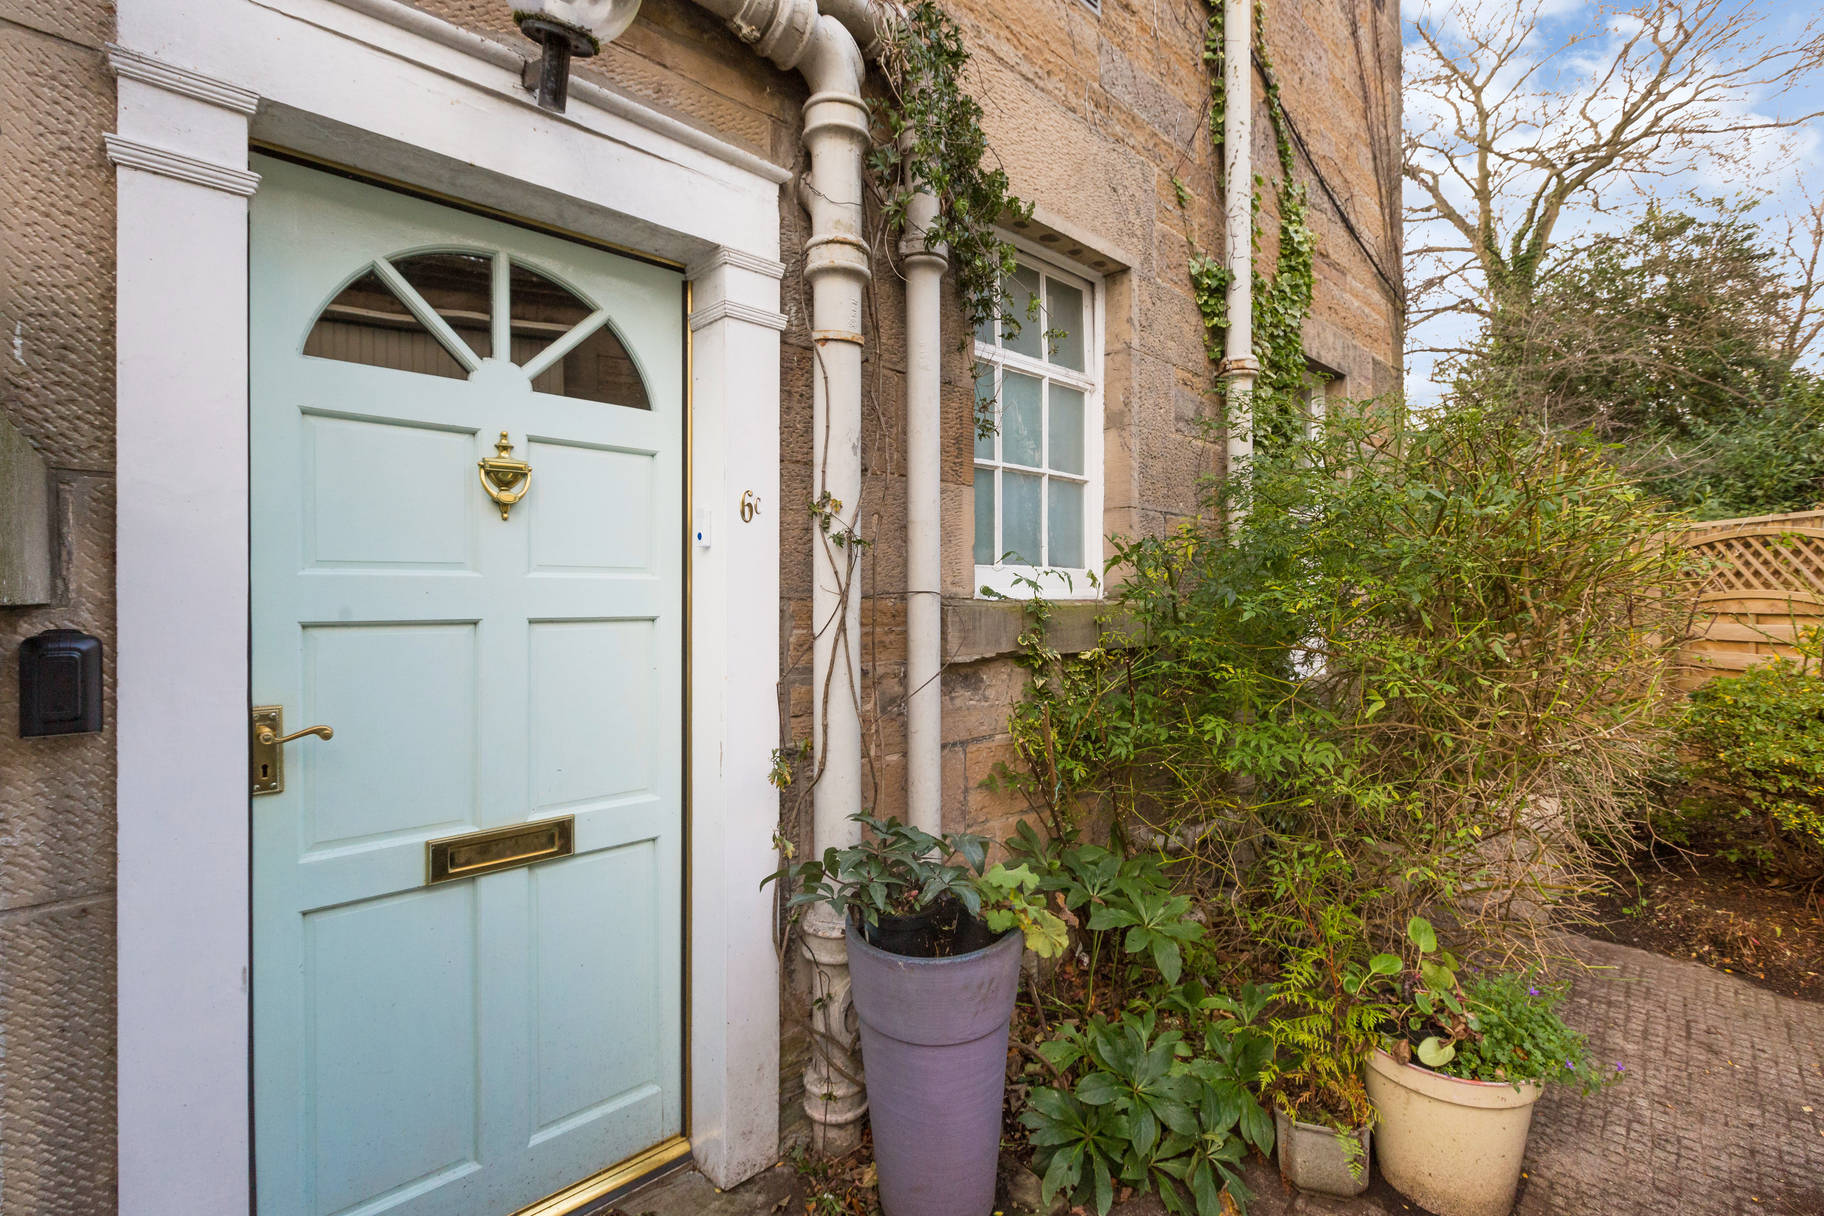 6C Oswald Road, Grange, Edinburgh, EH9 2HF